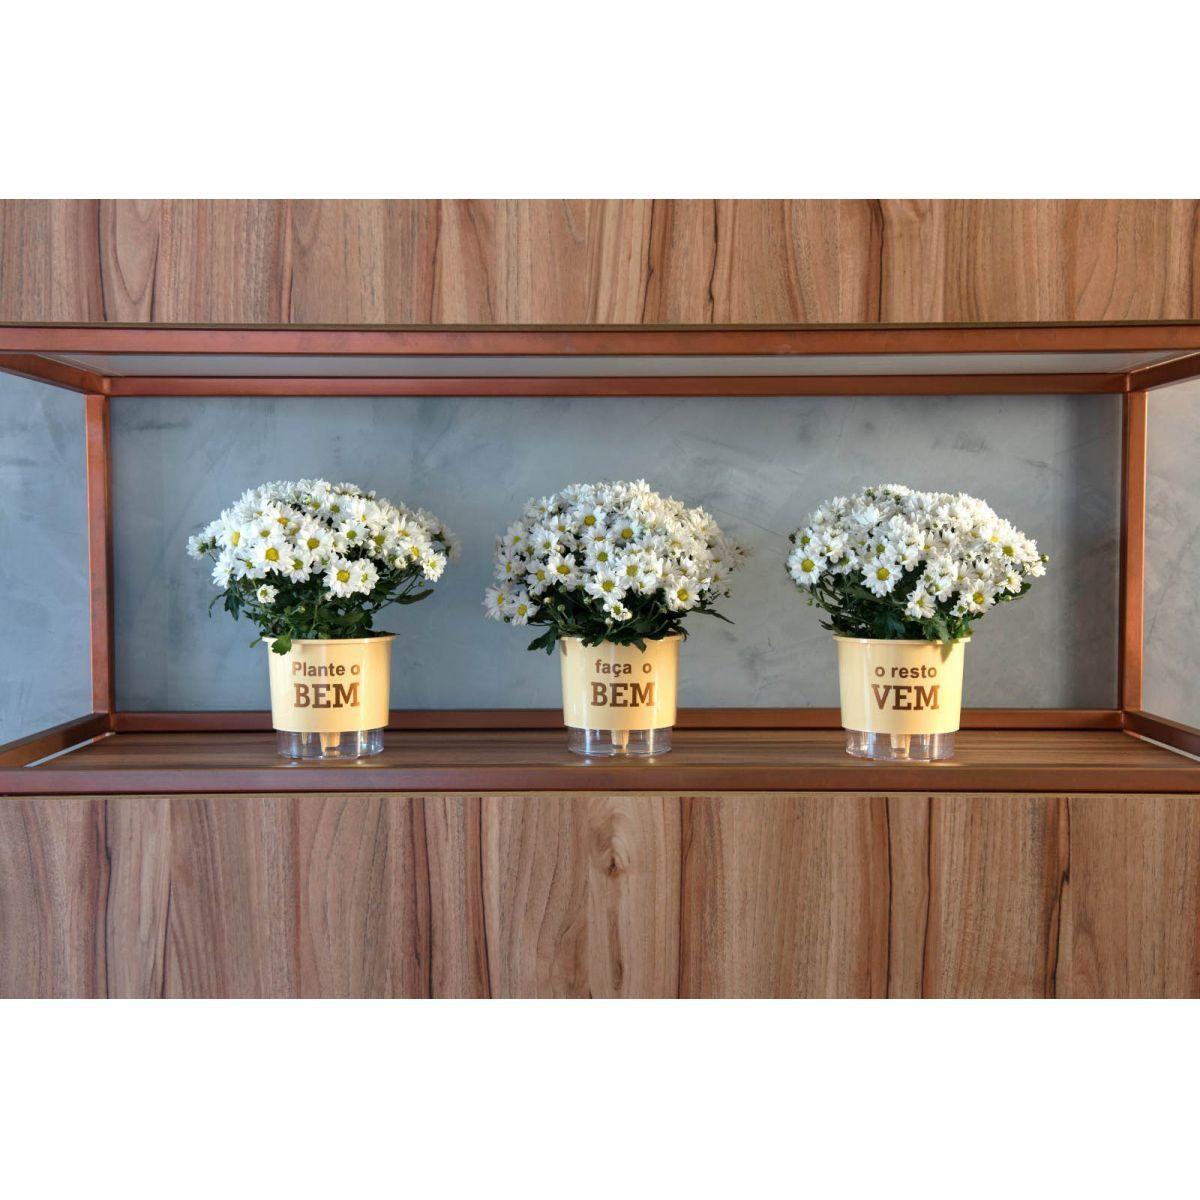 Kit 3 Vasos Autoirrigáveis Pequenos N02 12 cm x 11 cm Plante o Bem Pêssego